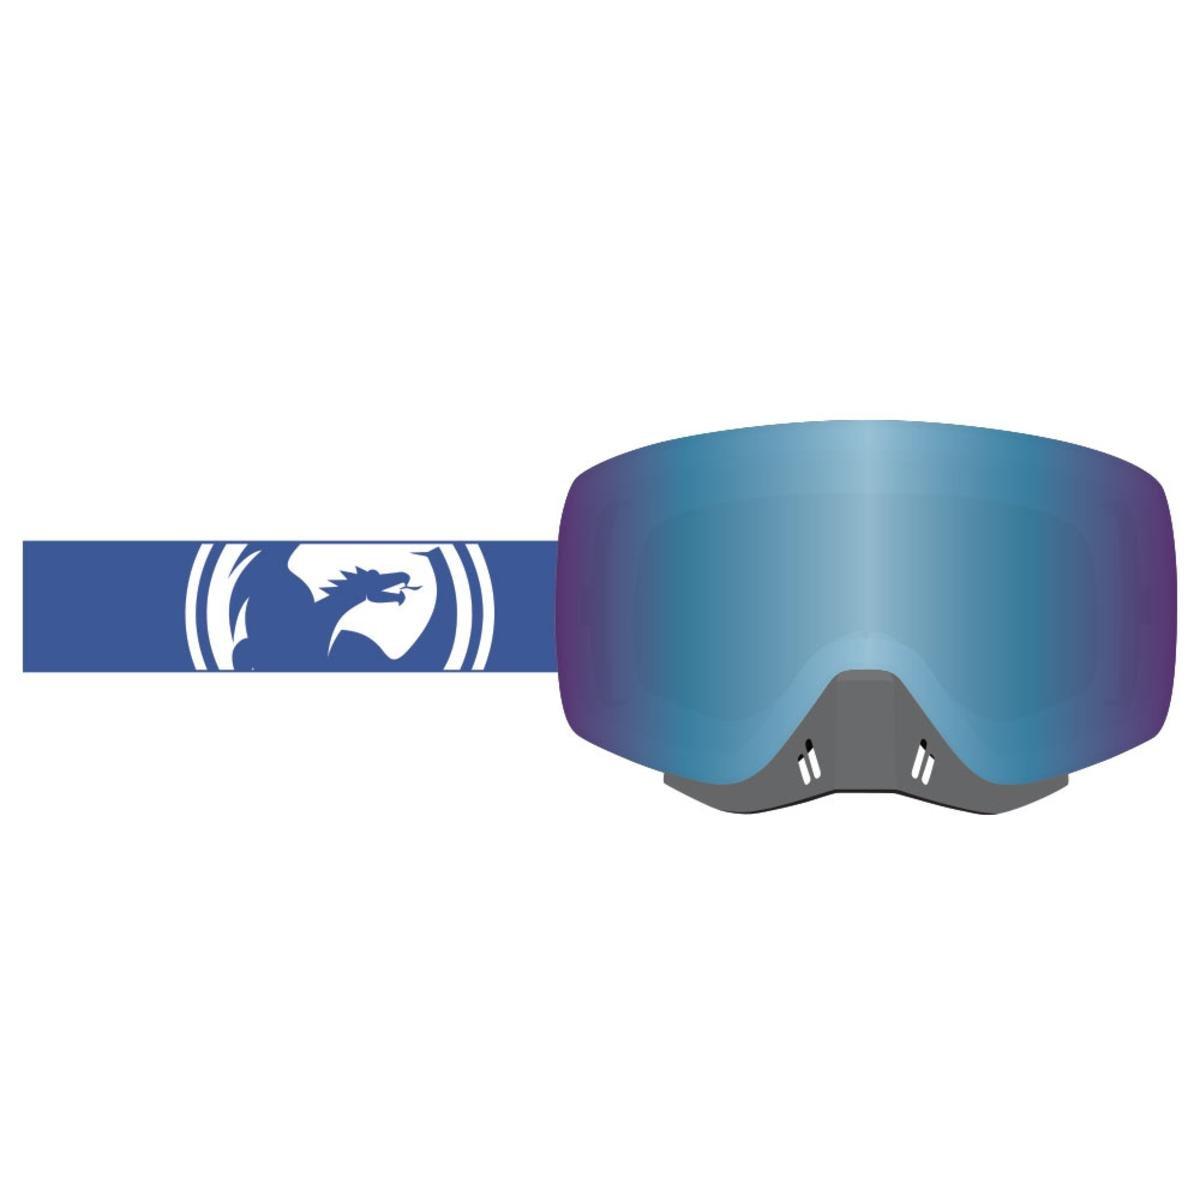 Dragon Alliance Unisex-Adult's Nfxs Goggle (Blue-White Split/Blue Steel Ion Lens, One Size)